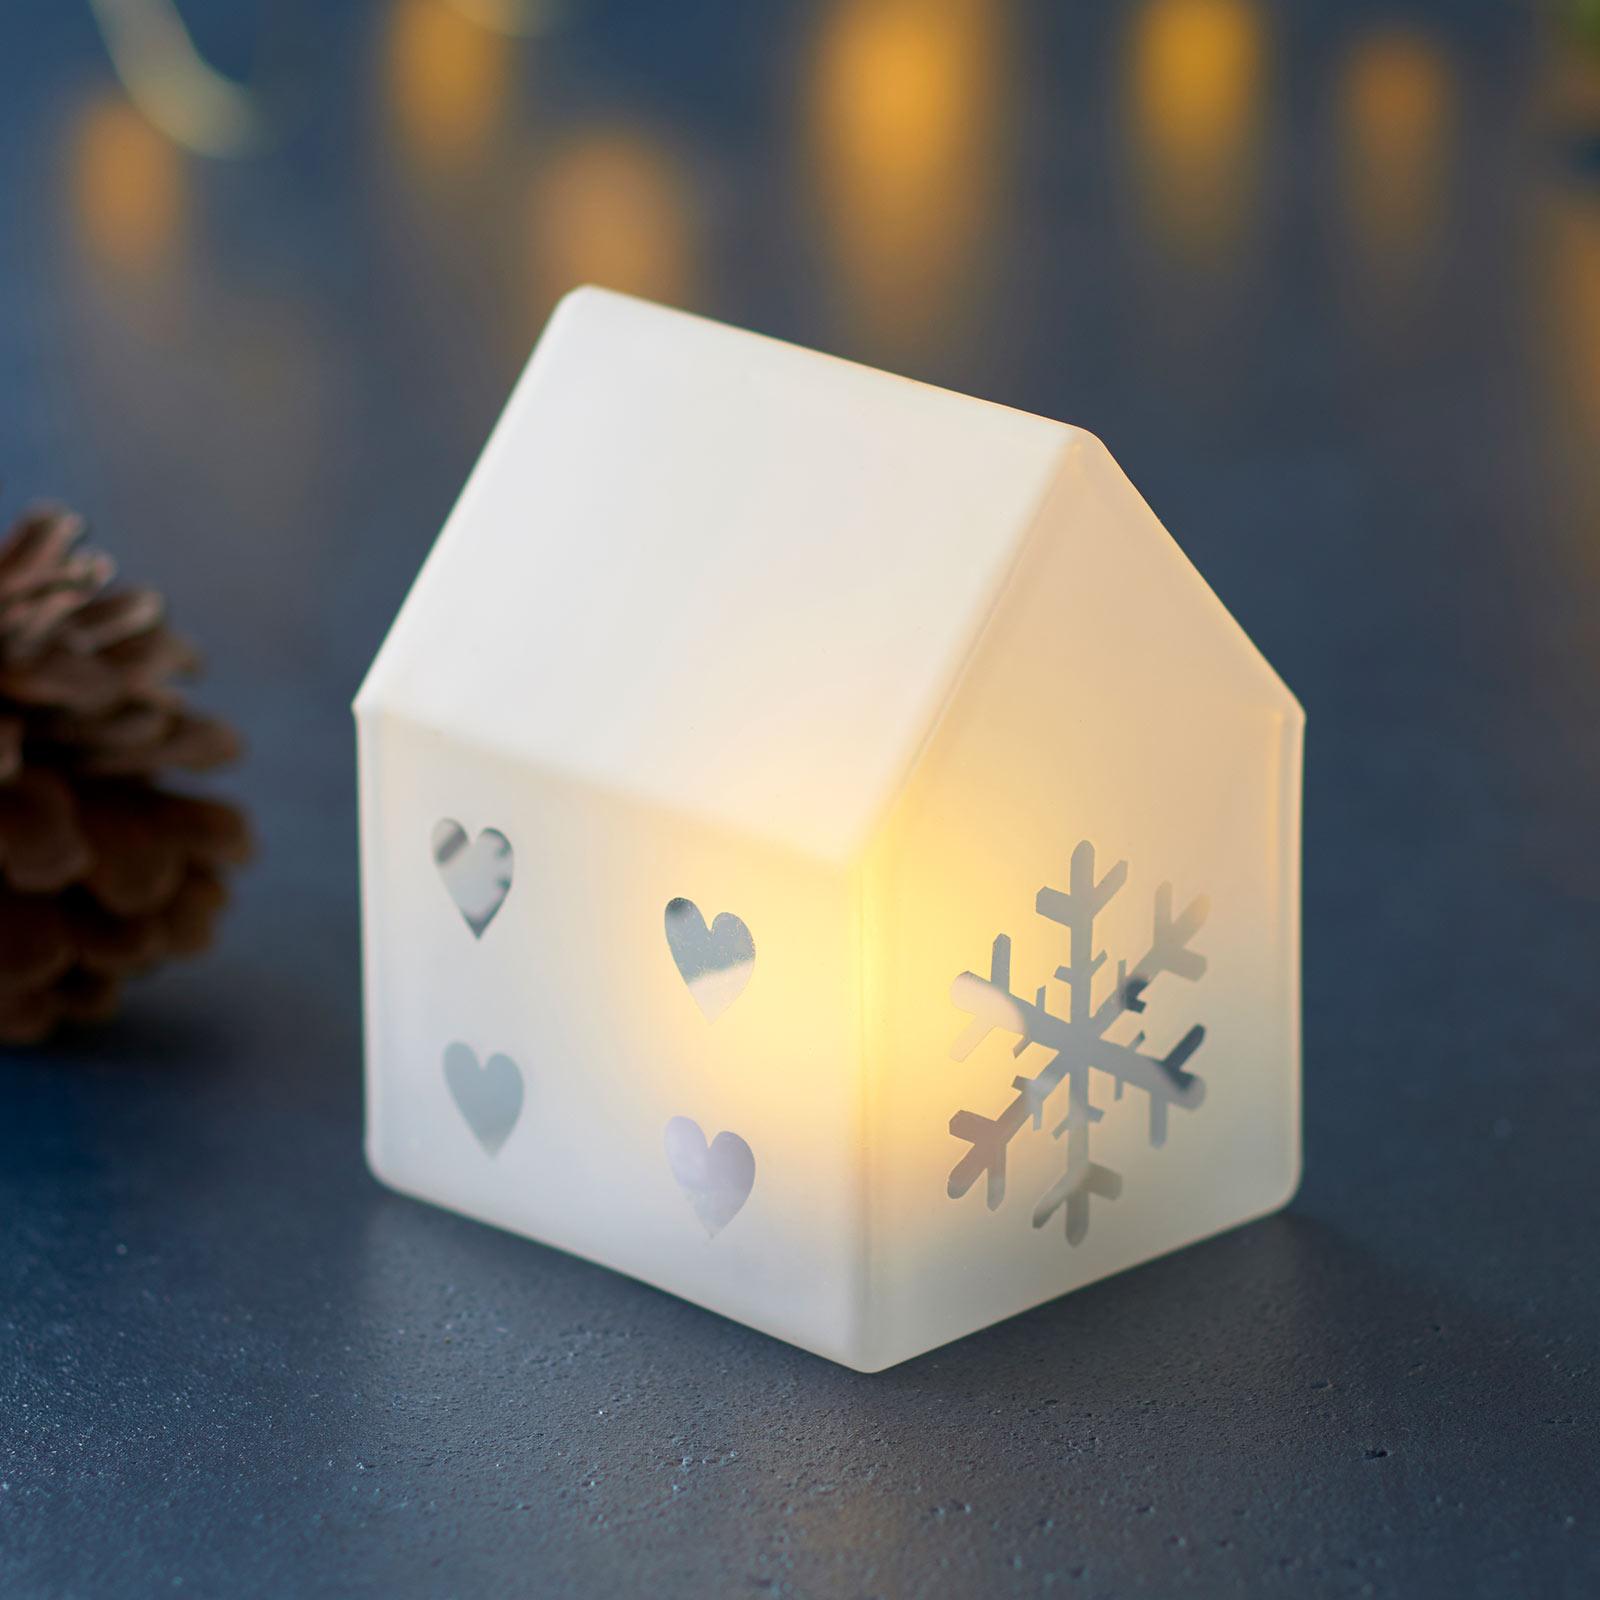 Lámpara decorativa LED Santa House, altura 8,5 cm